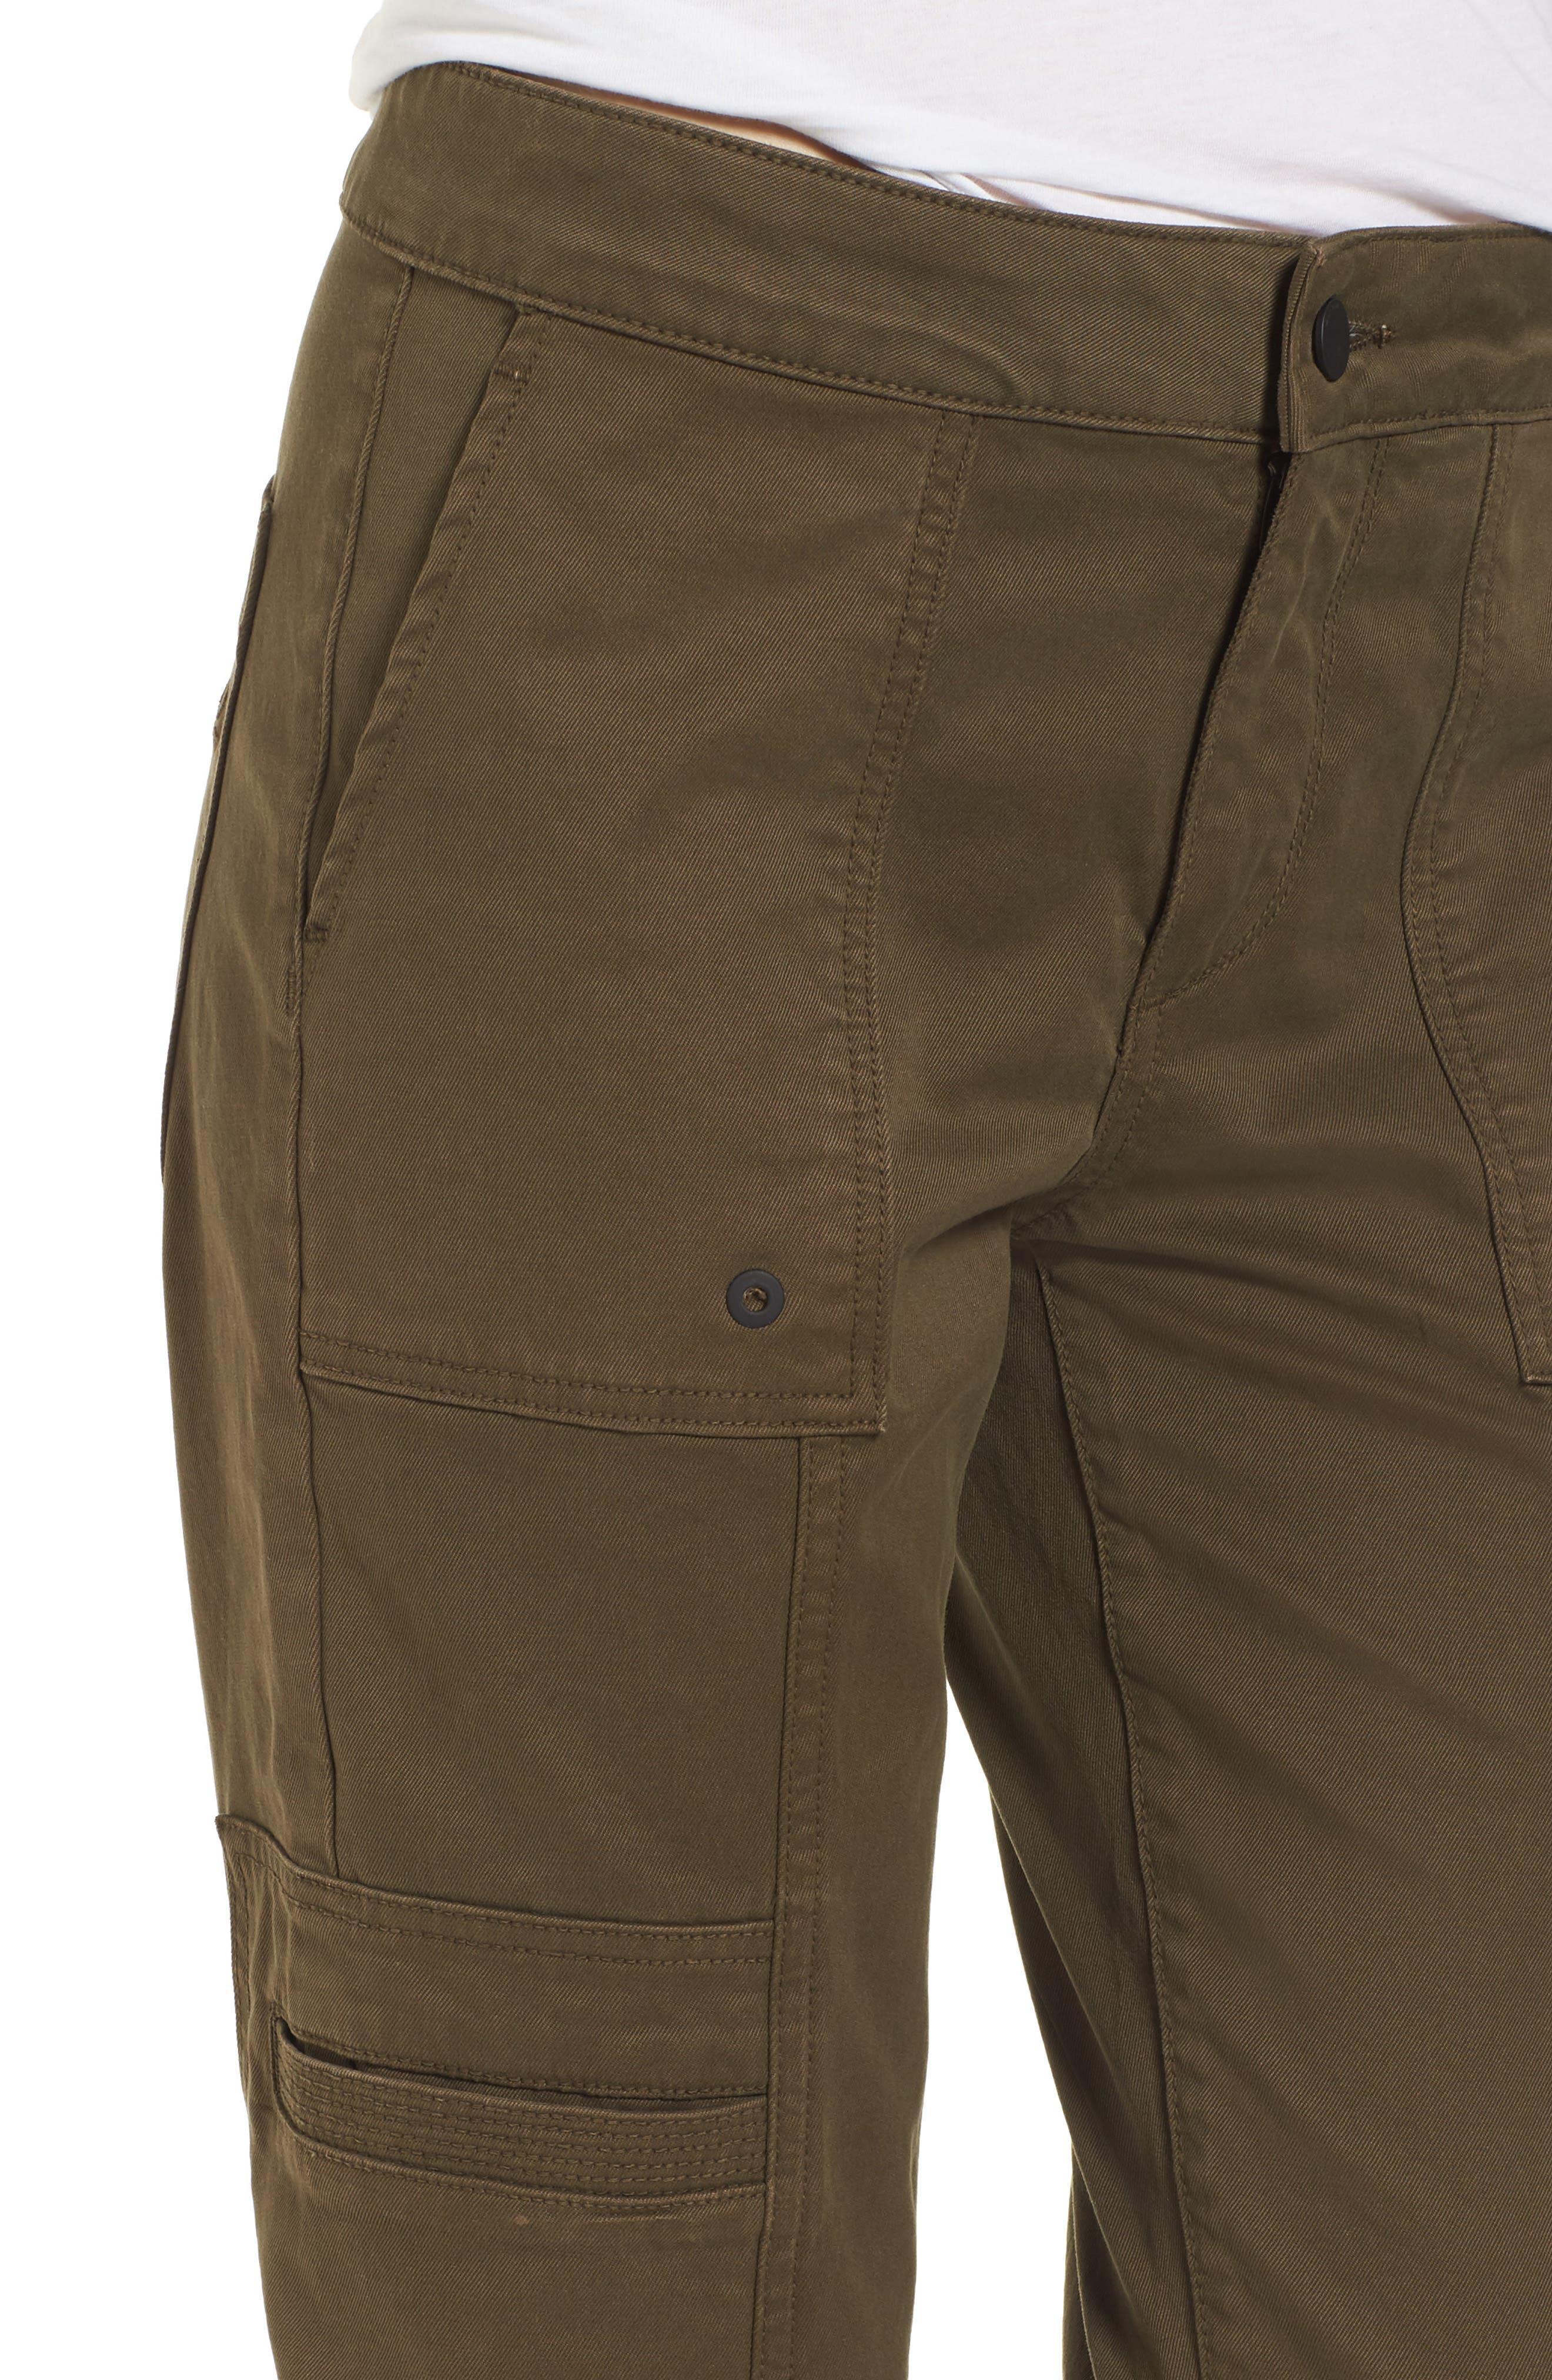 Elliot Slouchy Slim Cargo Pants,                             Alternate thumbnail 4, color,                             Driftless